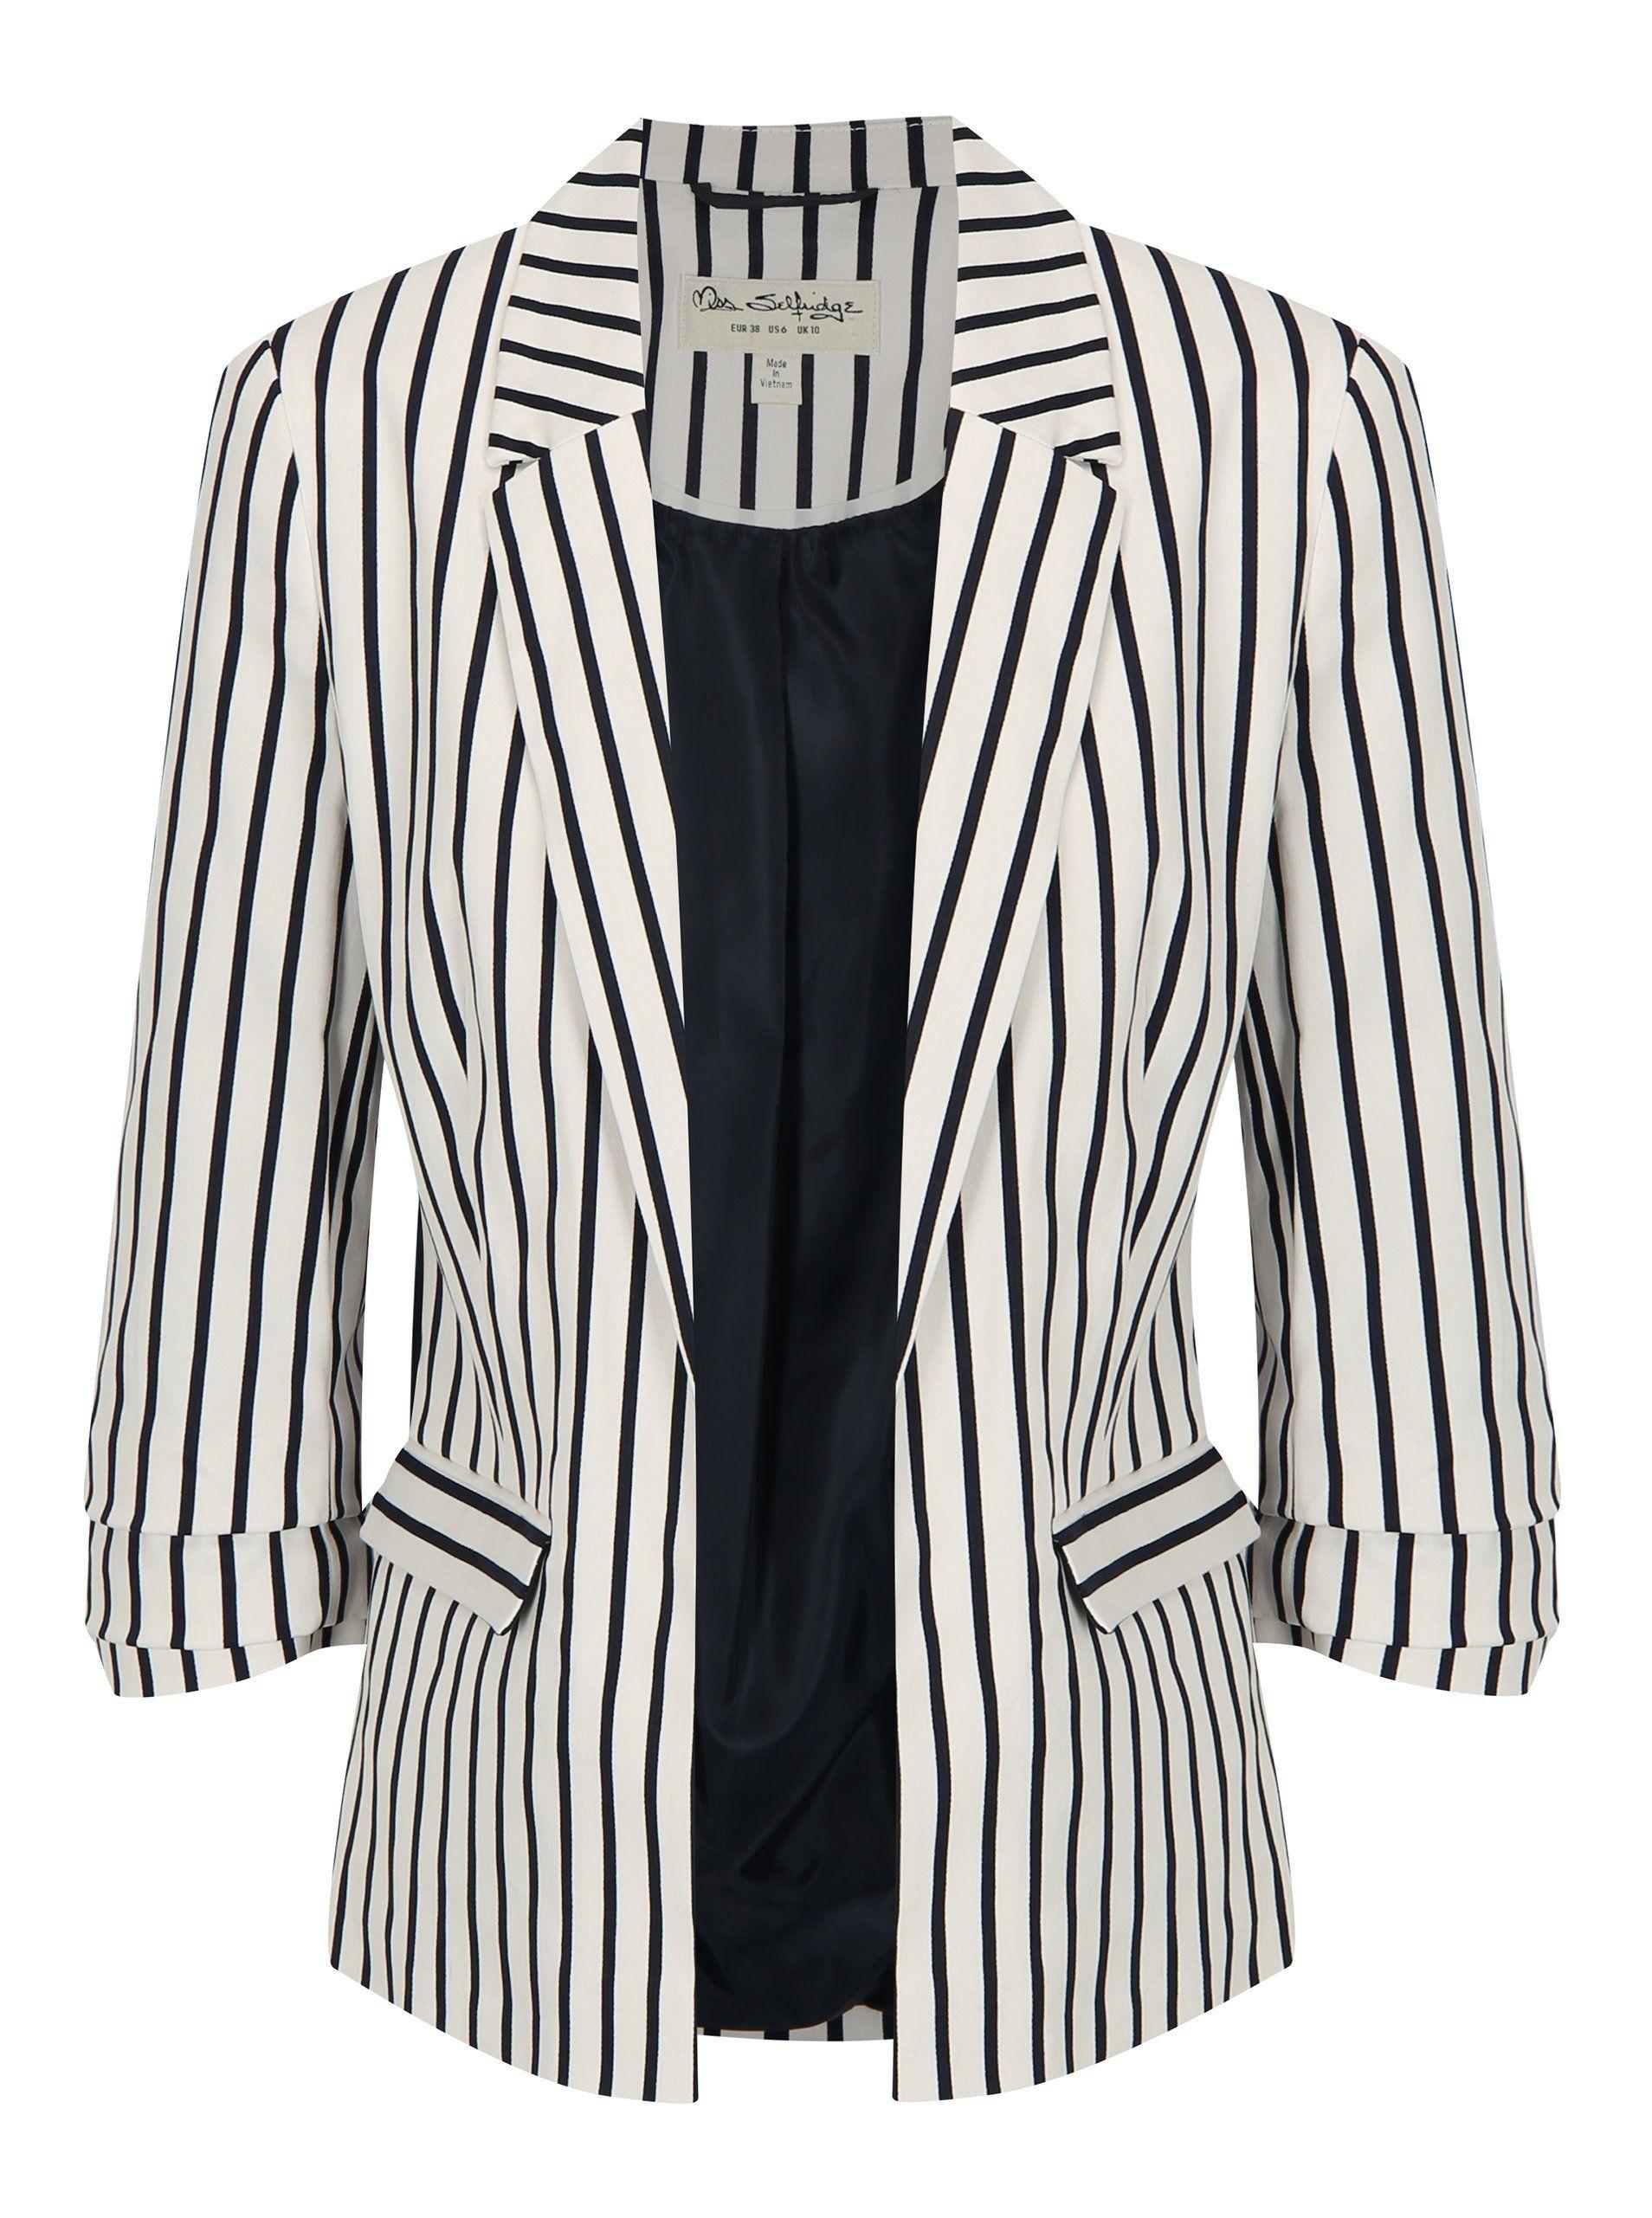 04919adecb24 Modro-biele kostýmové pruhované sako Miss Selfridge